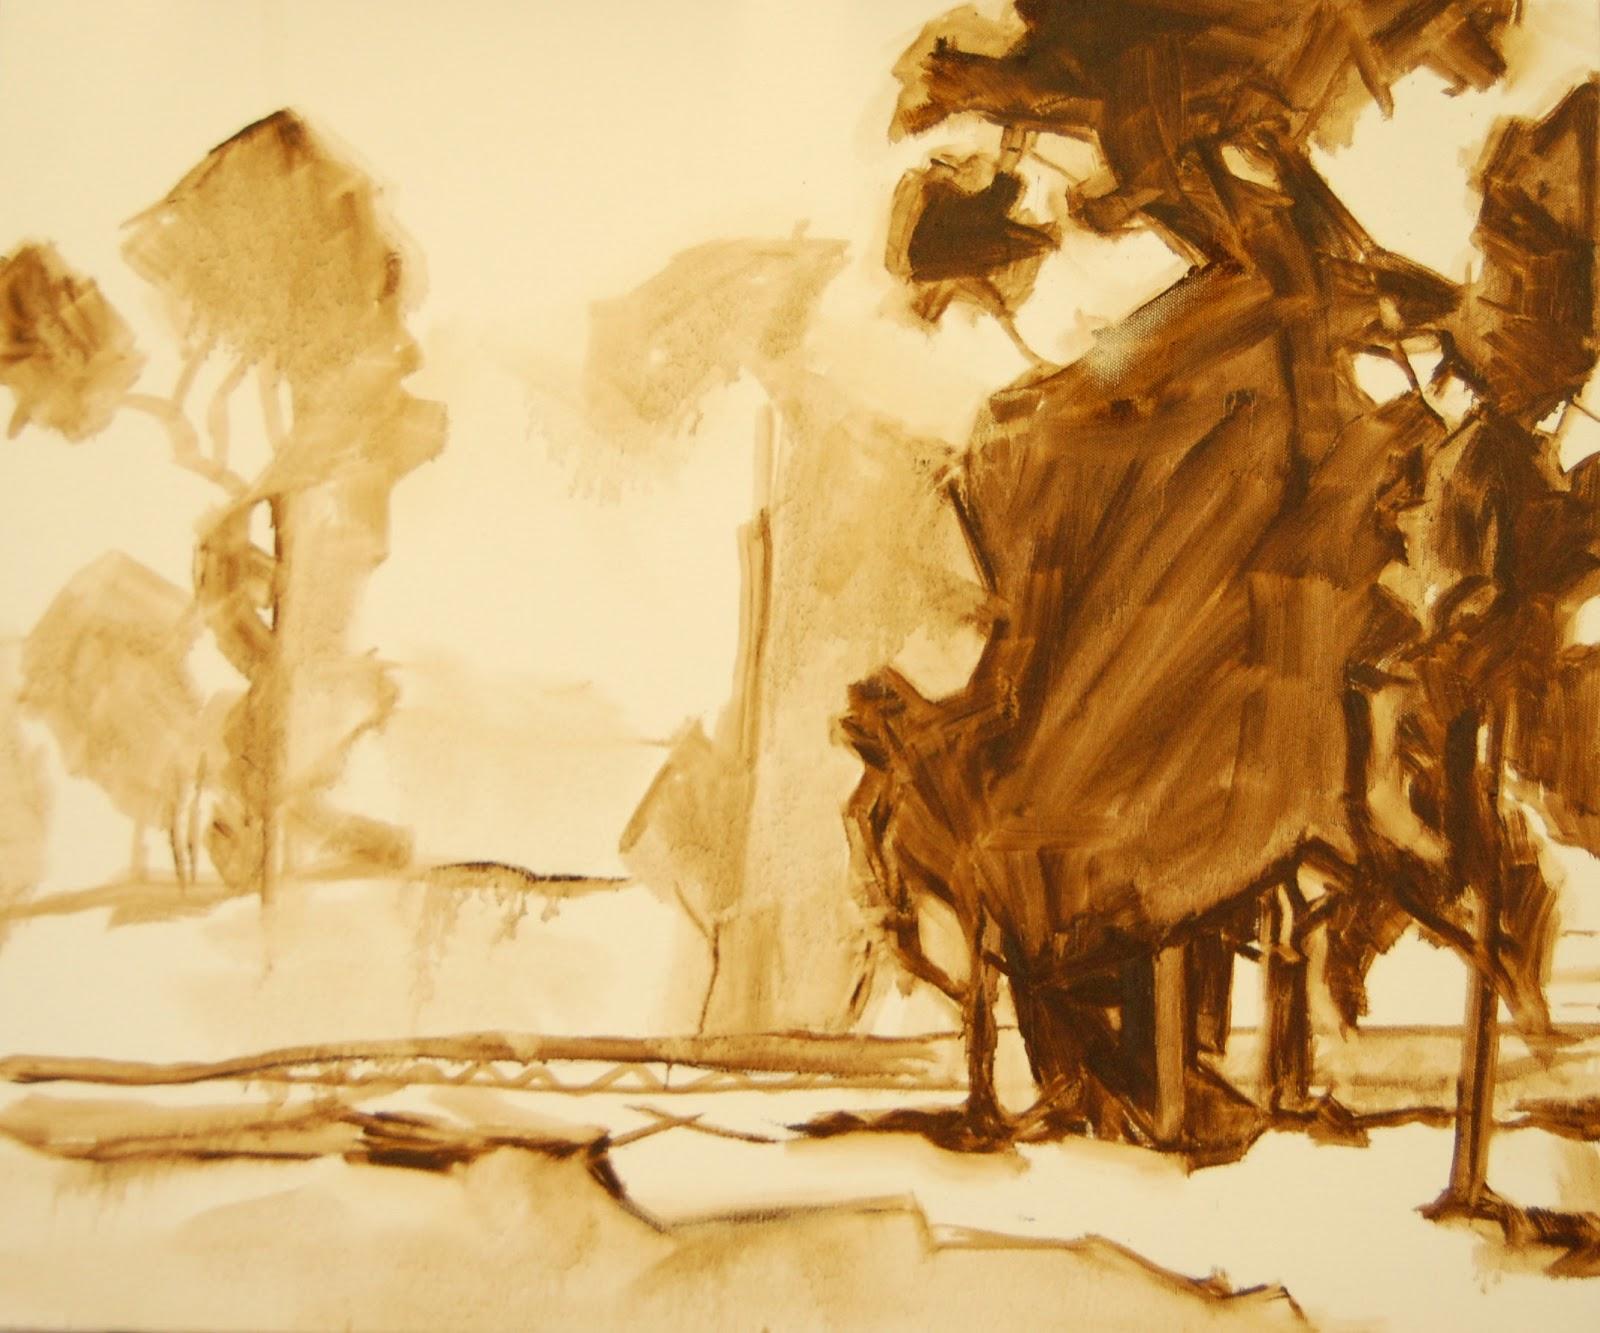 Julie Kirkland Fine Art: Copying a Master: Edgar Payne